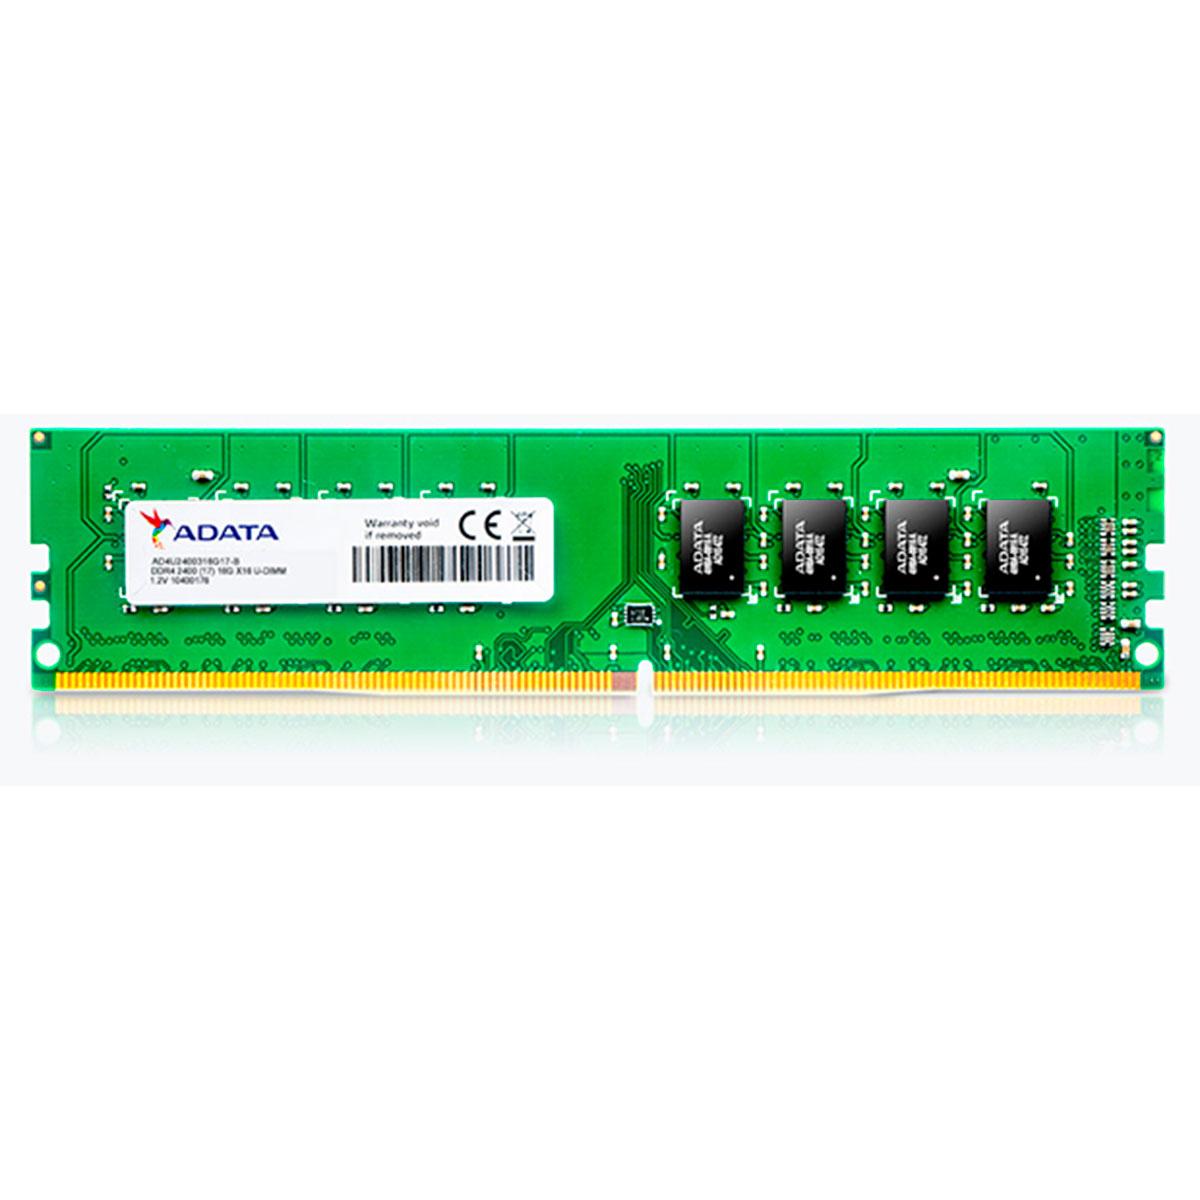 Memória Adata 4GB DDR4 2400MHz  - AD4U2400W4G17-S